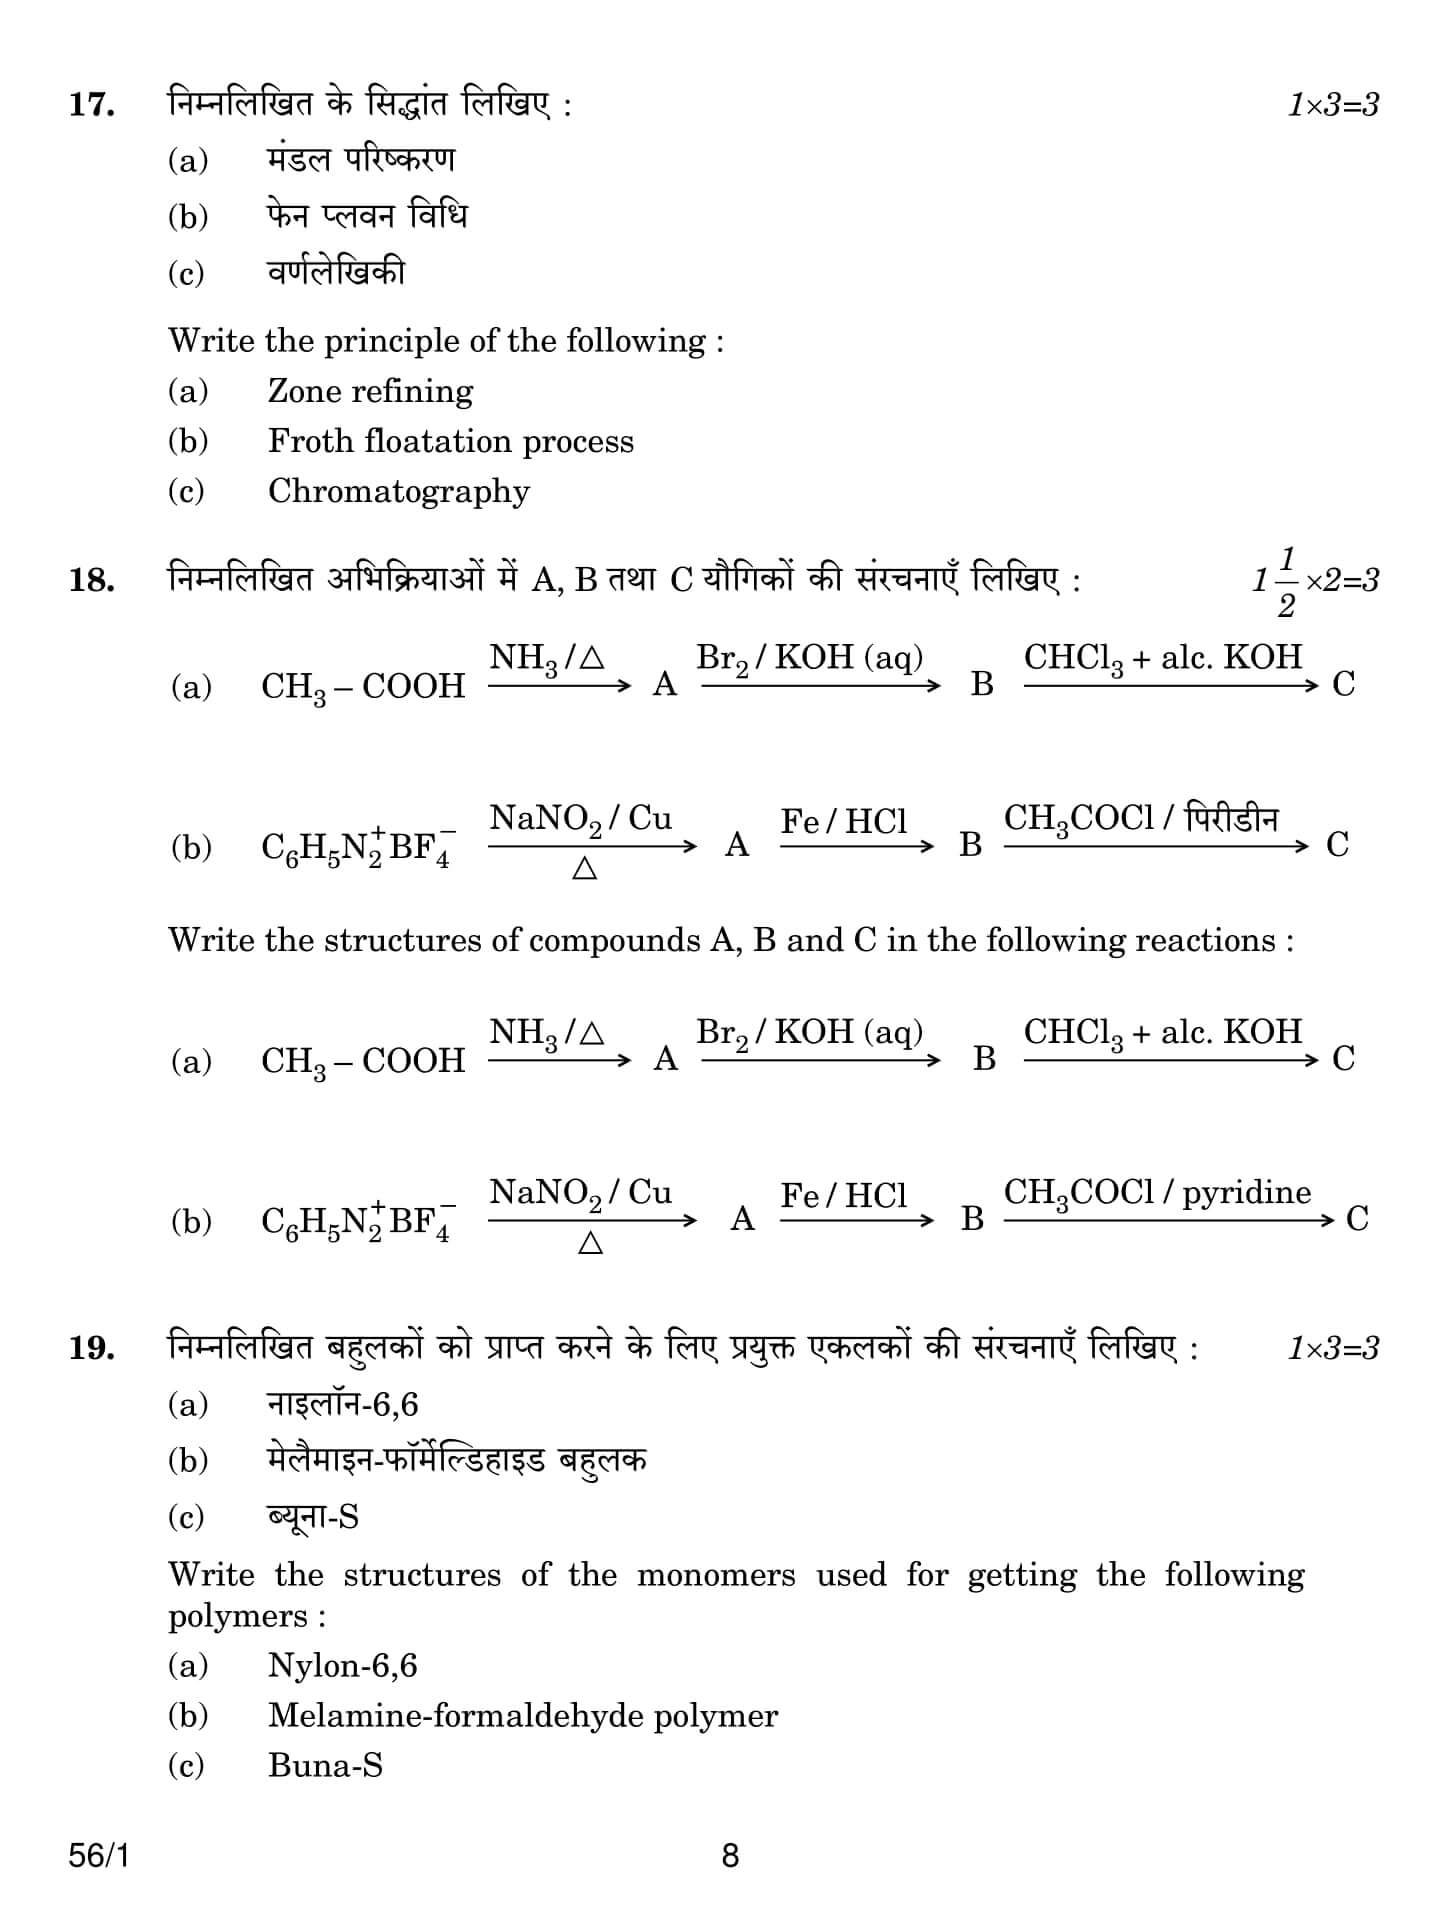 cbse class 12 qs paper 2017 chemistry set 1